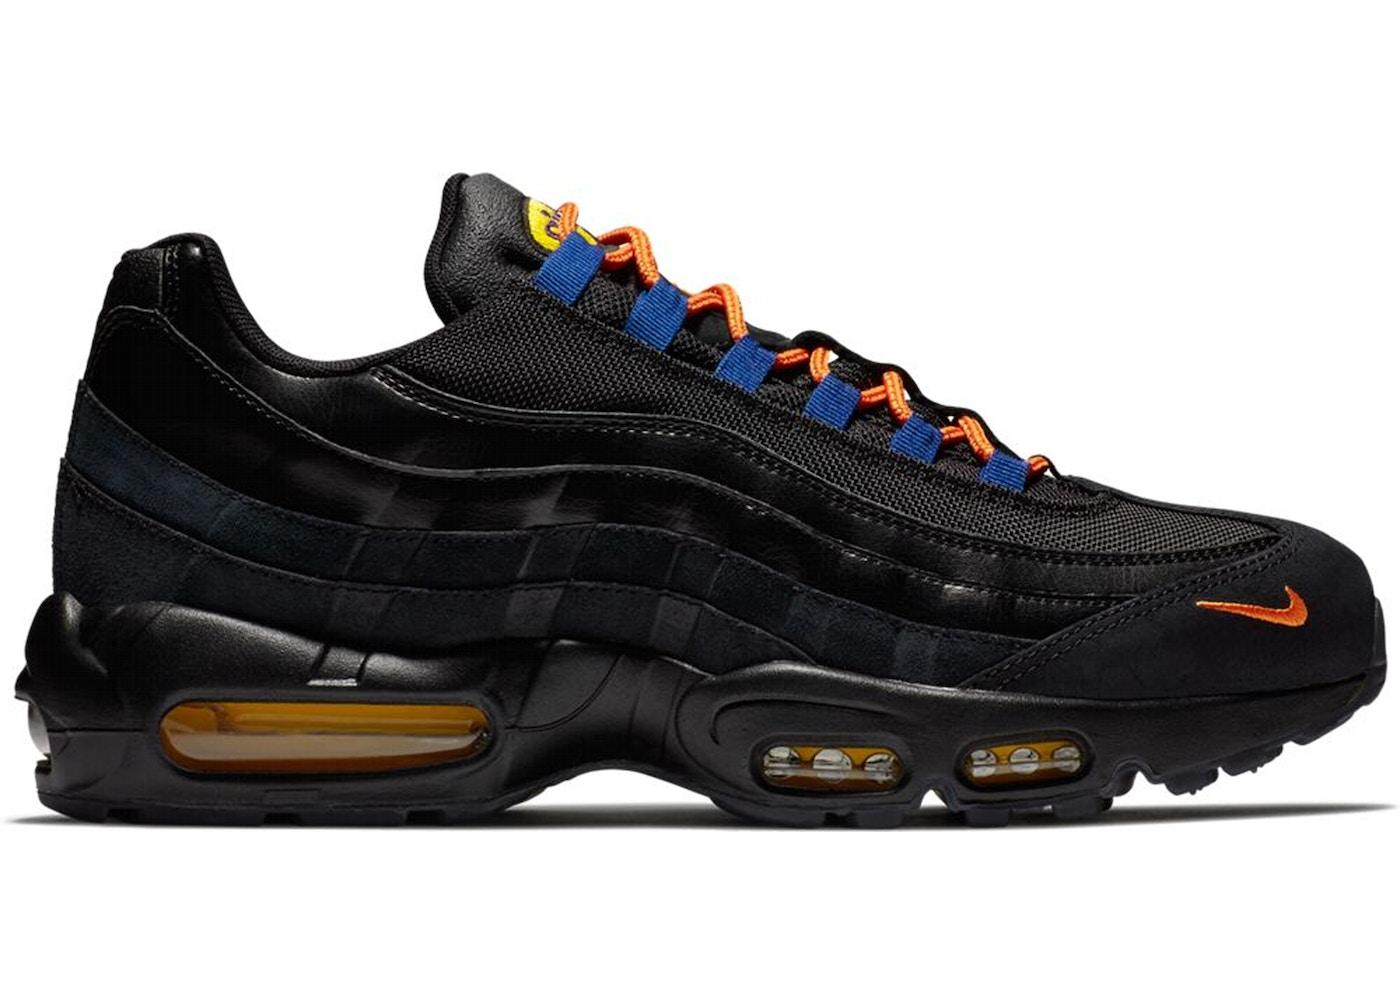 detailing 664cd 1db83 Buy Nike Air Max 95 Shoes   Deadstock Sneakers